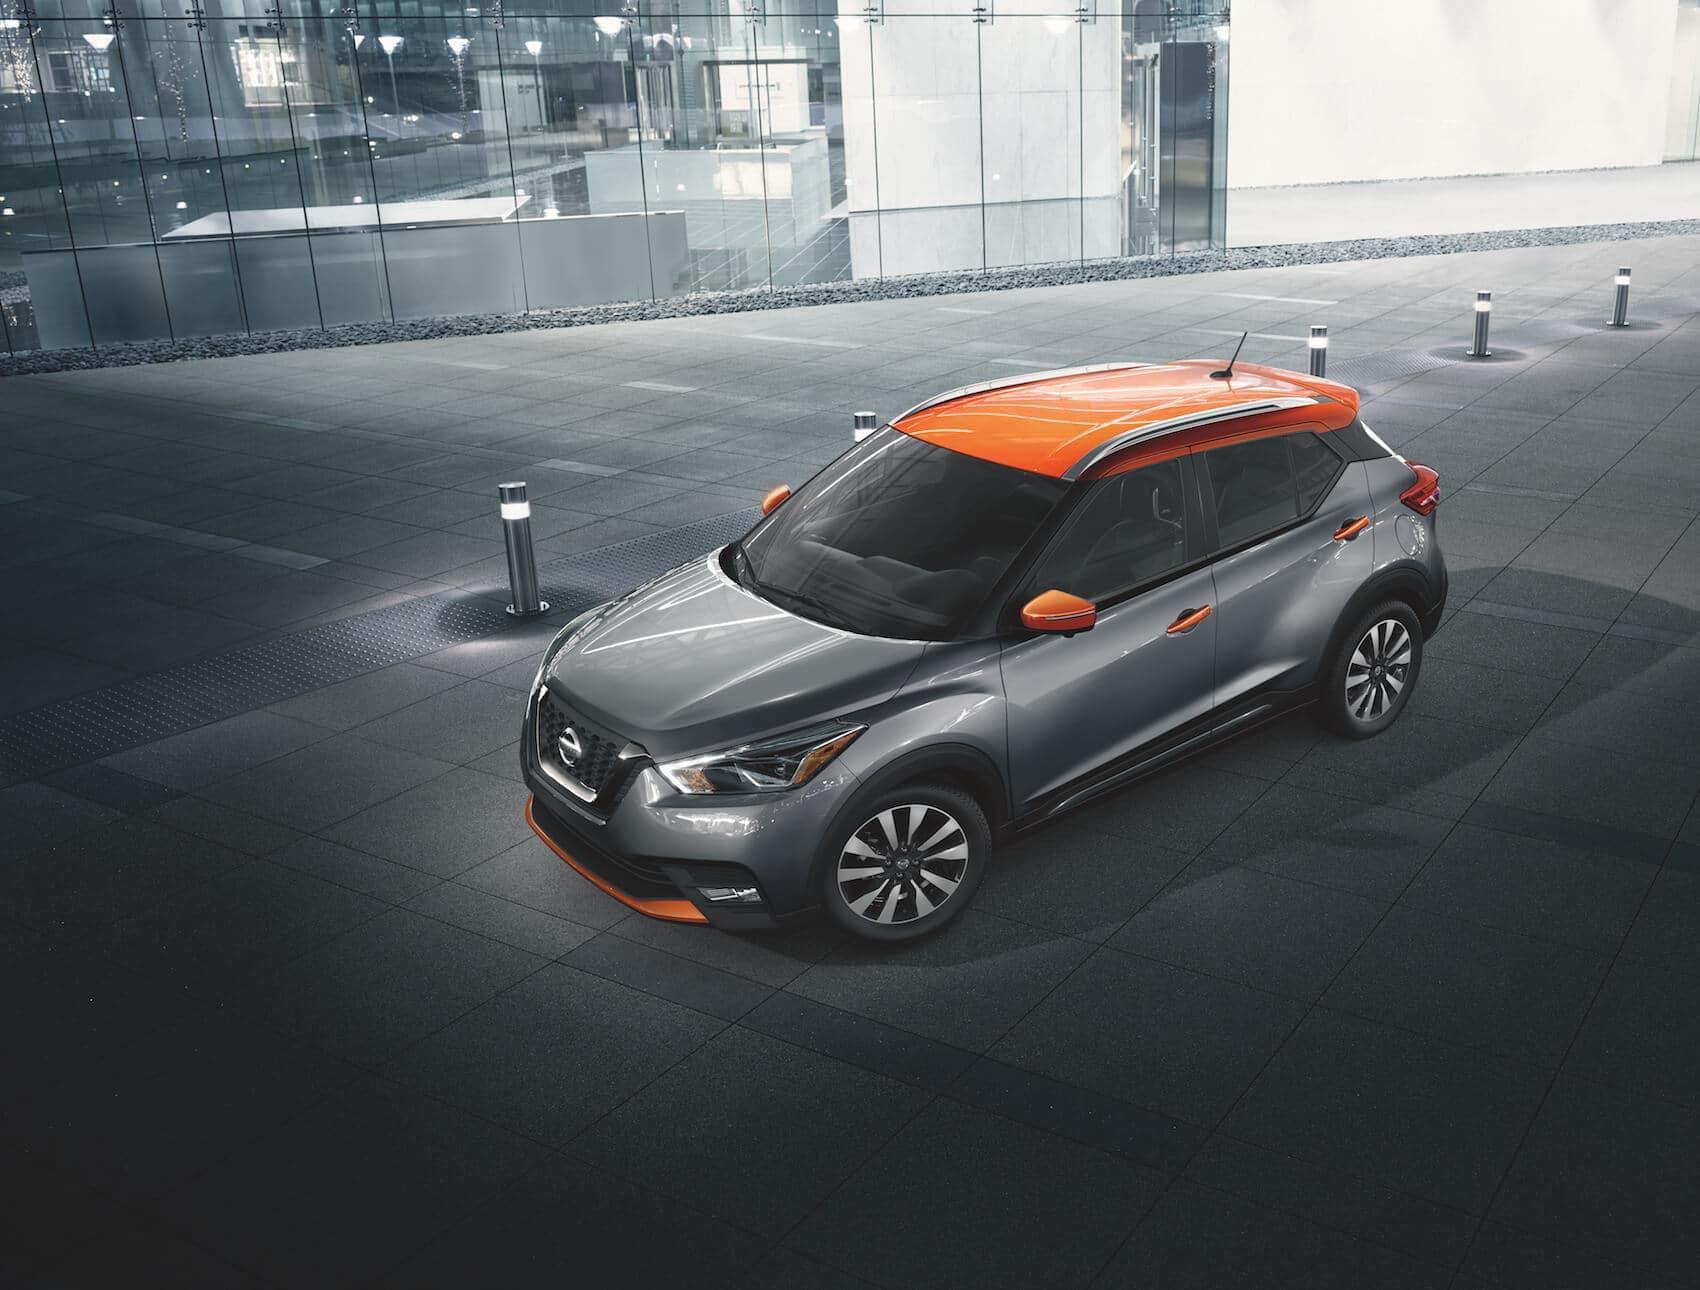 2020 Nissan Kicks New Castle, DE